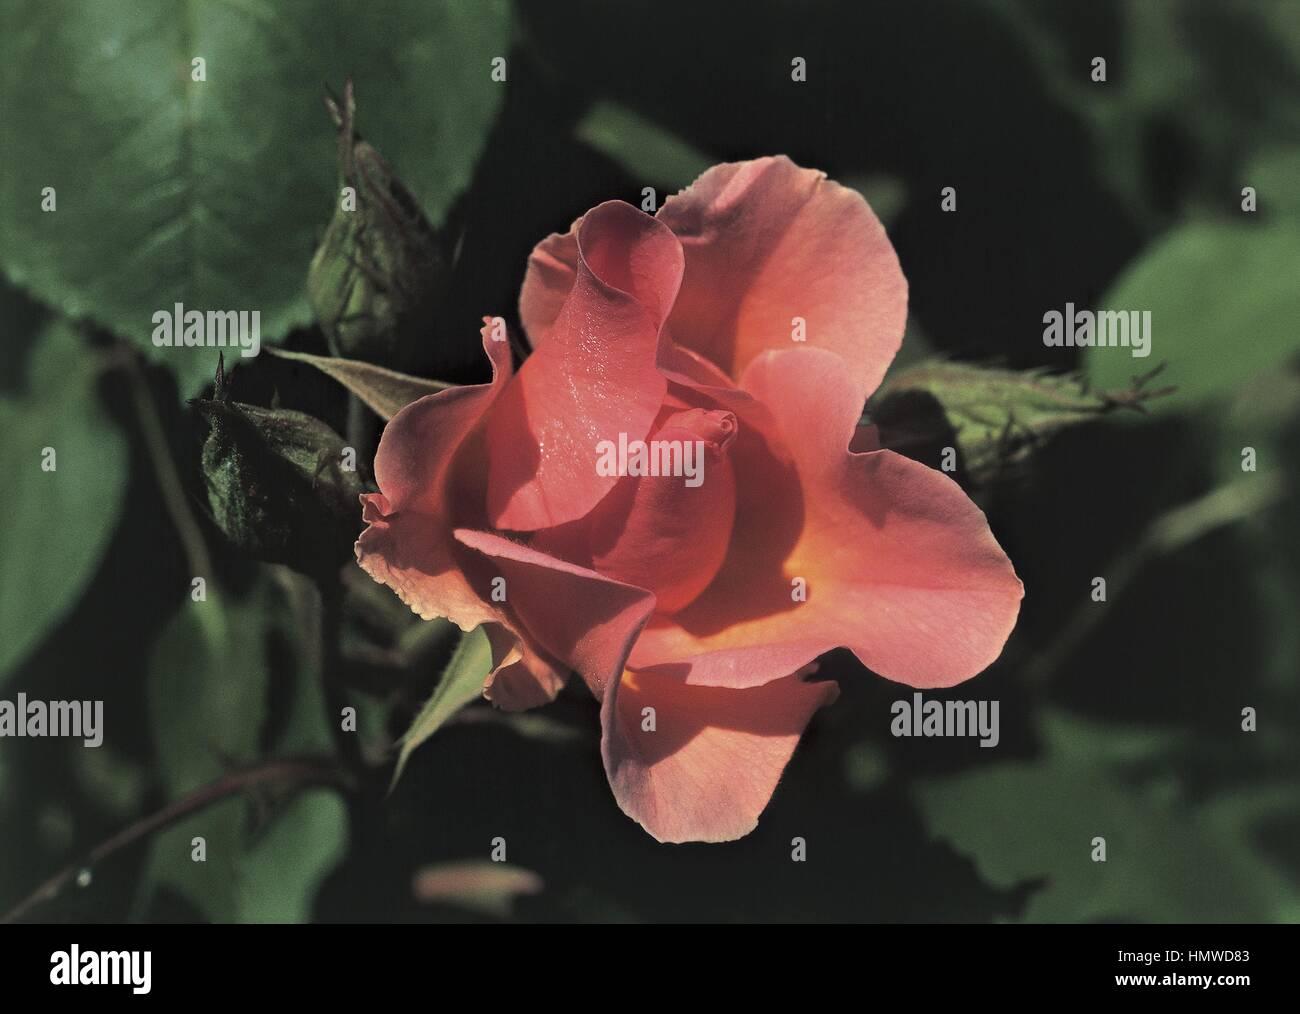 Botanik - Rosengewächse - Soiree de Bonheur rose, var. Cropal. Stockbild